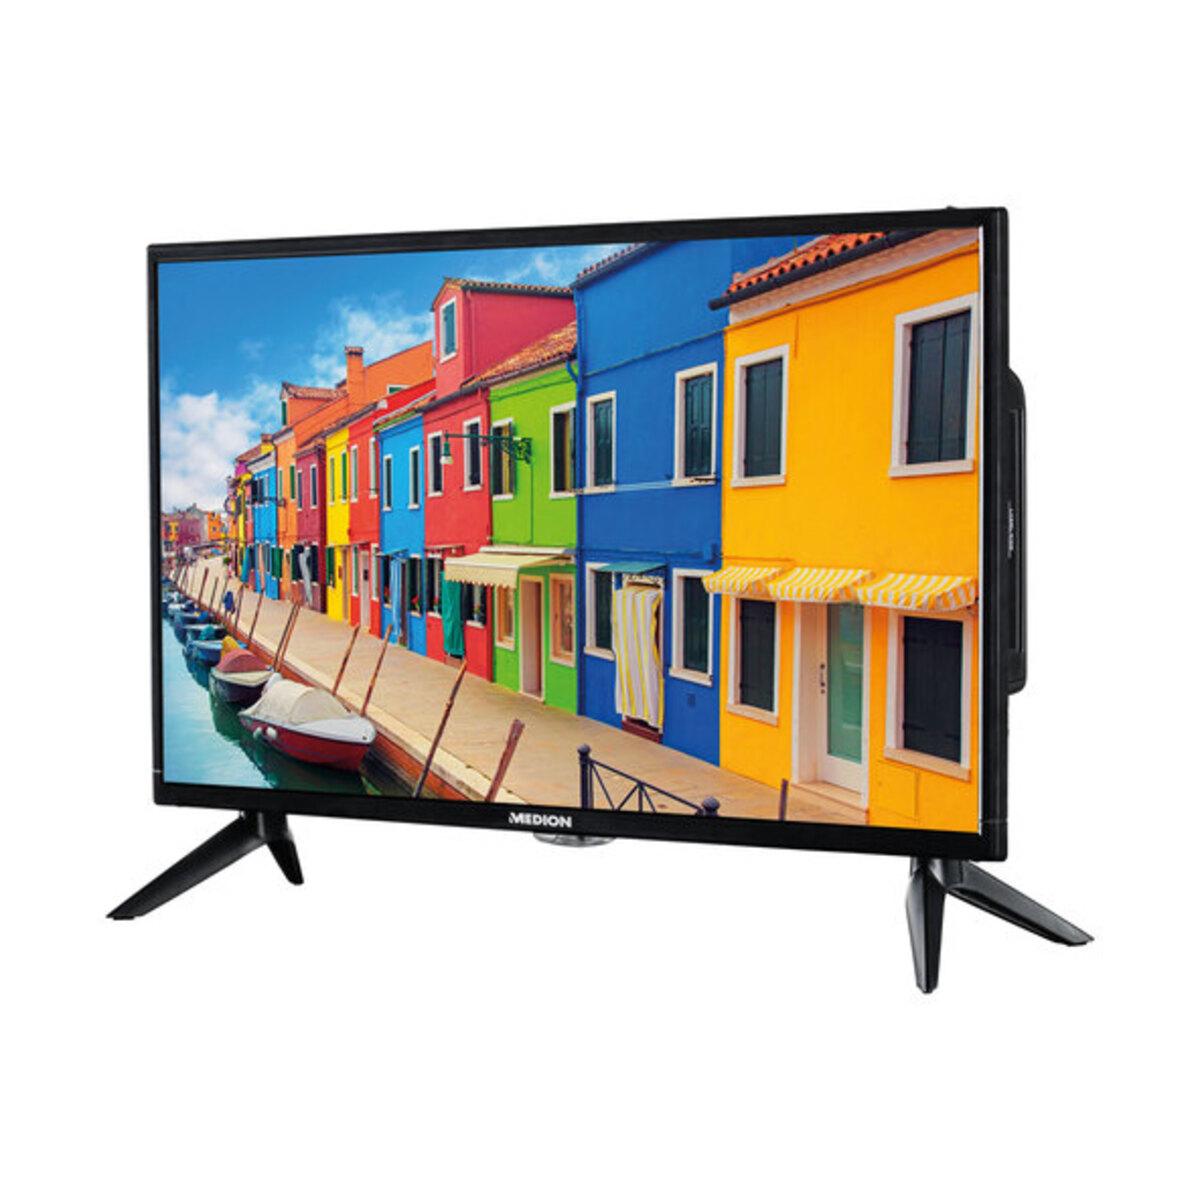 "Bild 4 von Full-HD LED-LCD-TV MEDION® LIFE® E12423 (MD 21733), 60,5 cm (23,8"")"